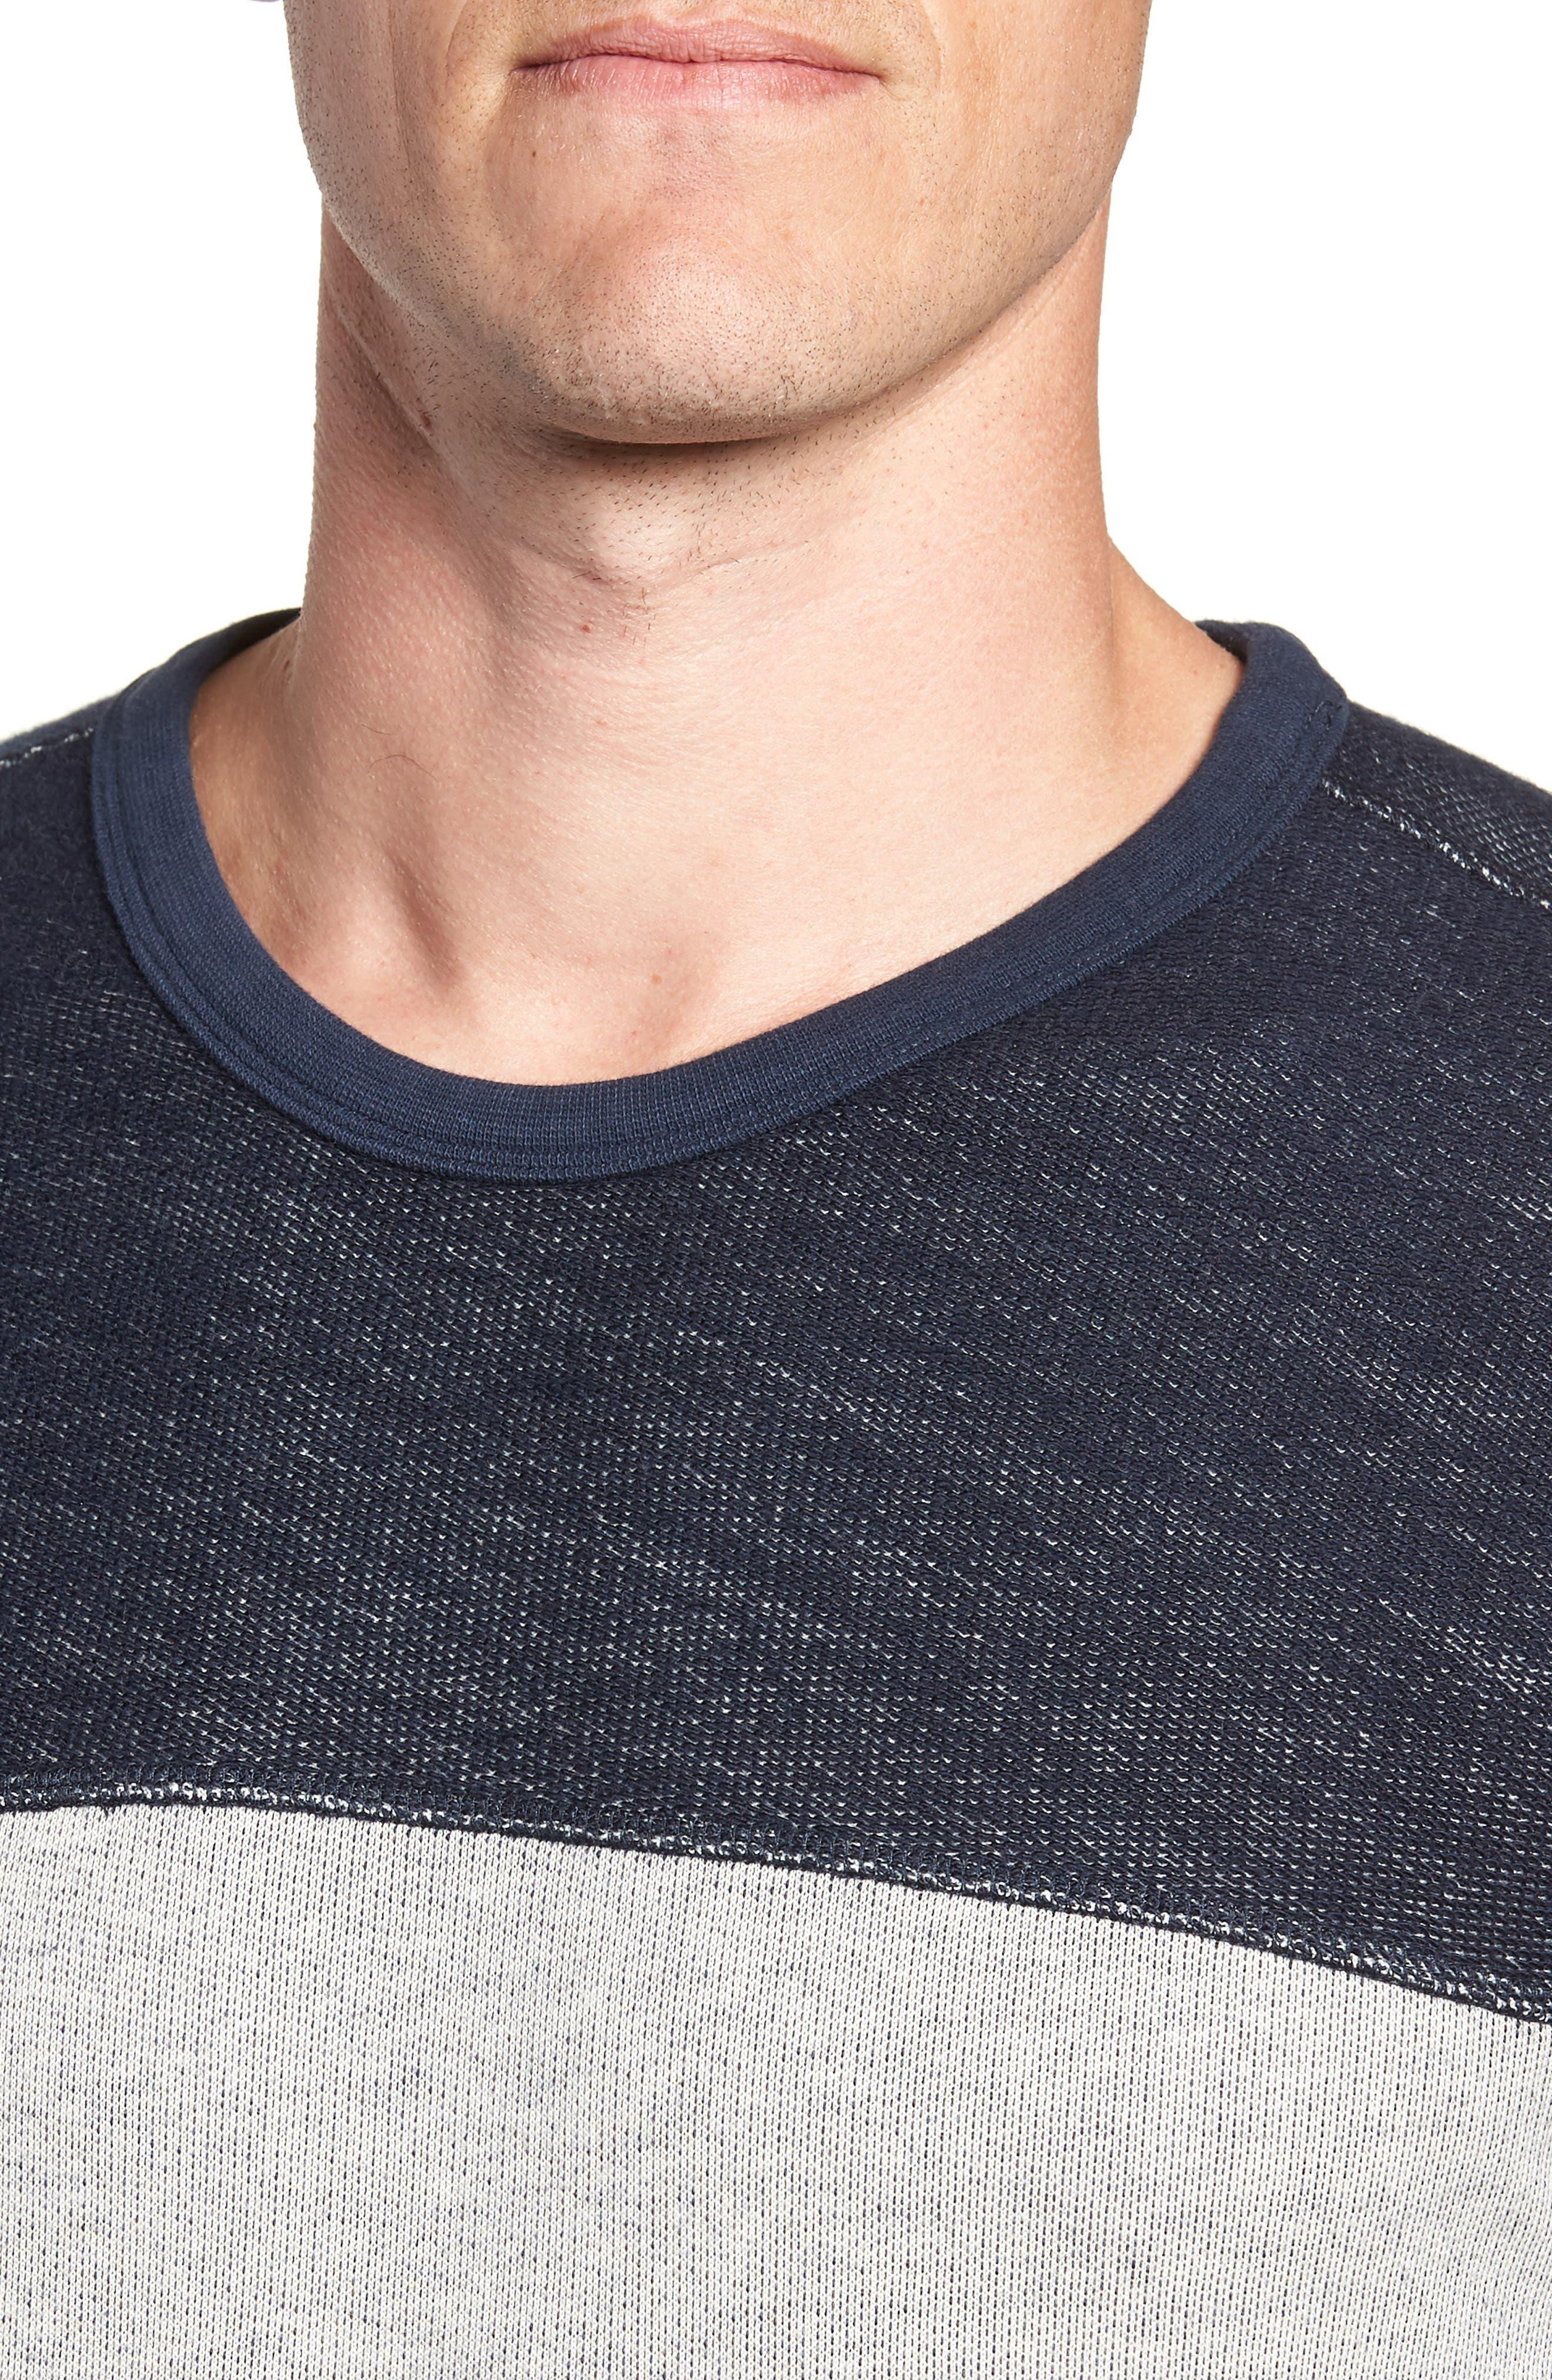 Reversible Colorblock Terry Sweatshirt,                             Alternate thumbnail 4, color,                             Navy / Grey